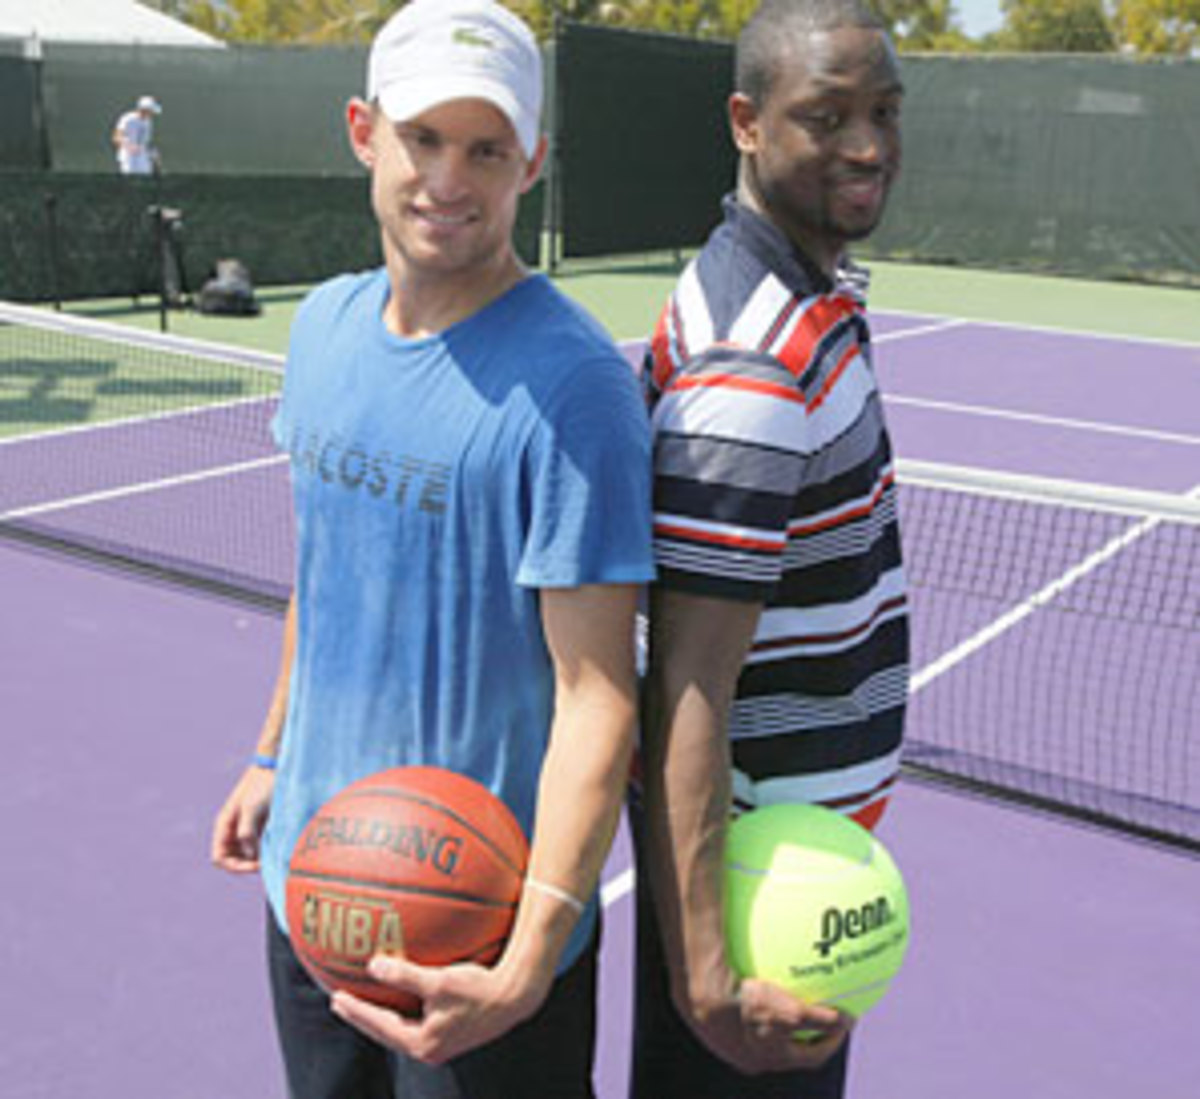 Andy Roddick and Dwayne Wade